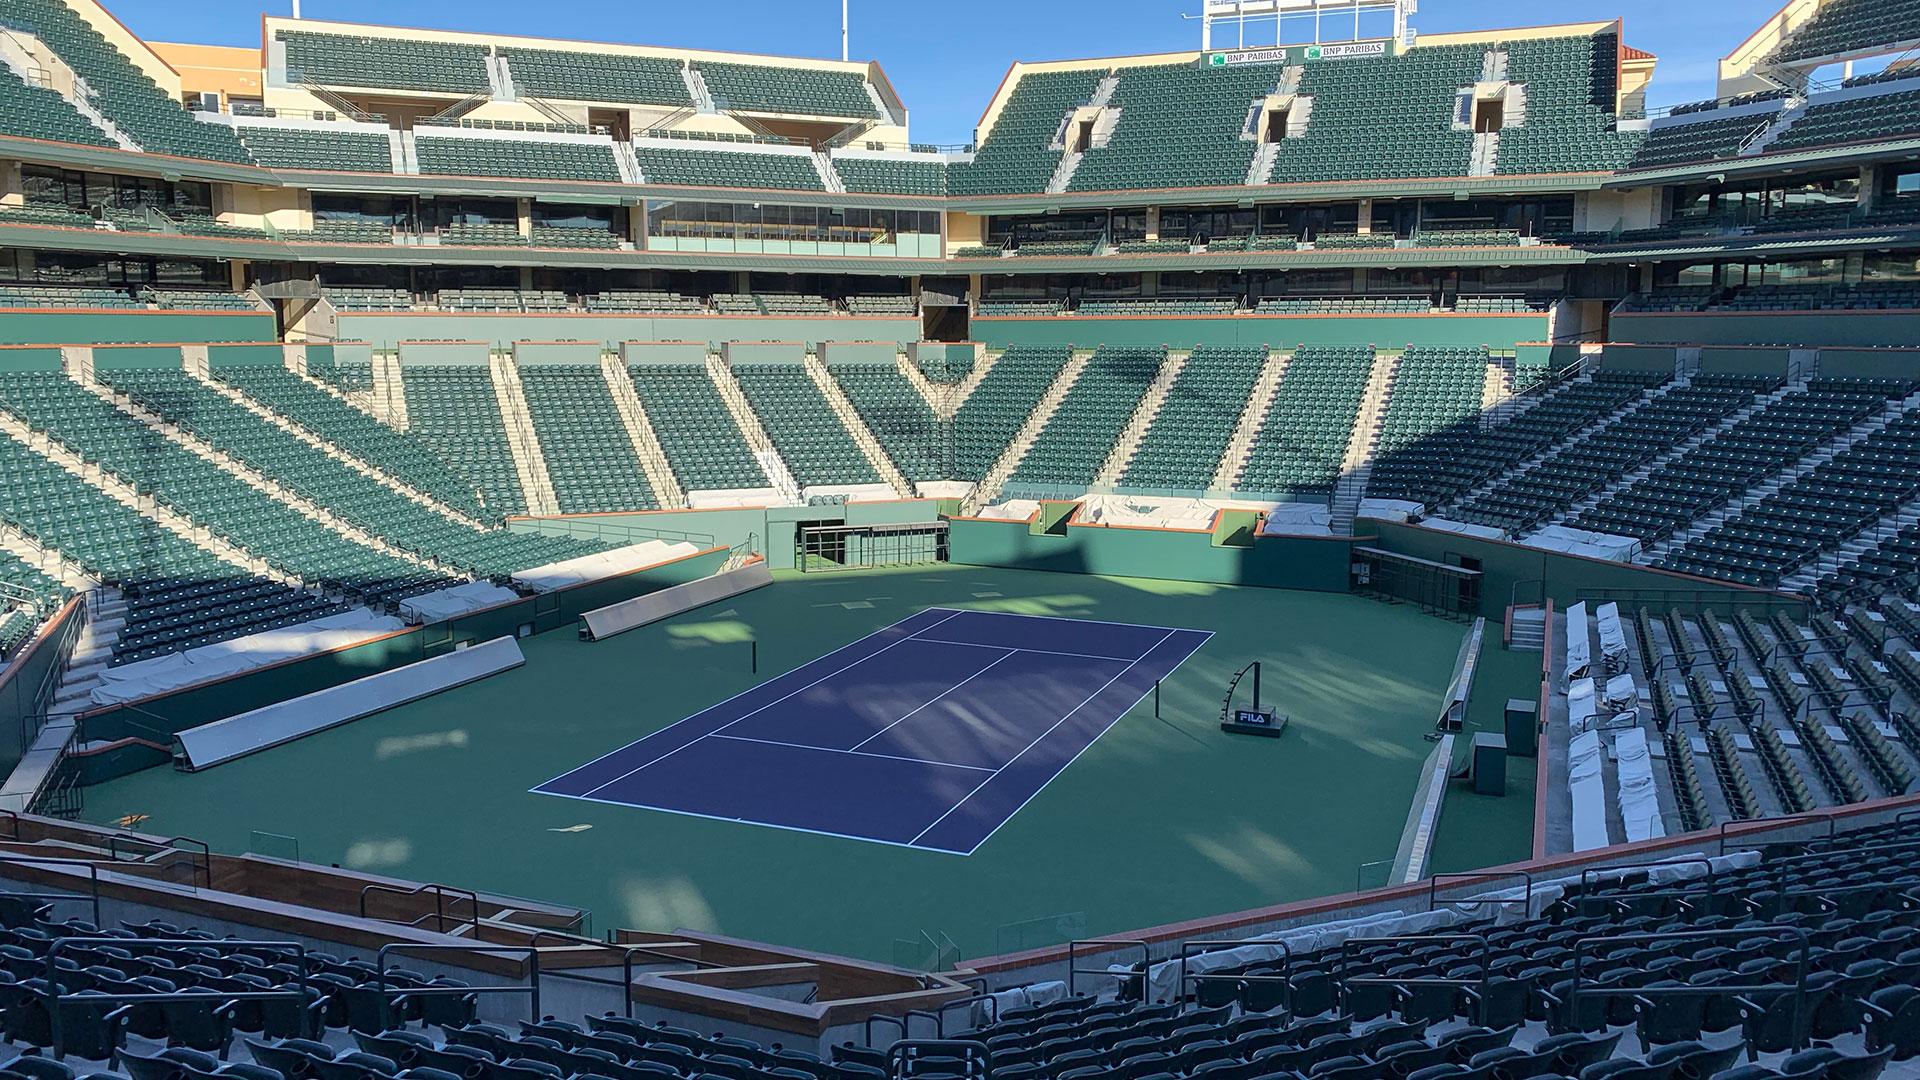 Tennis Indian Wells Ergebnisse